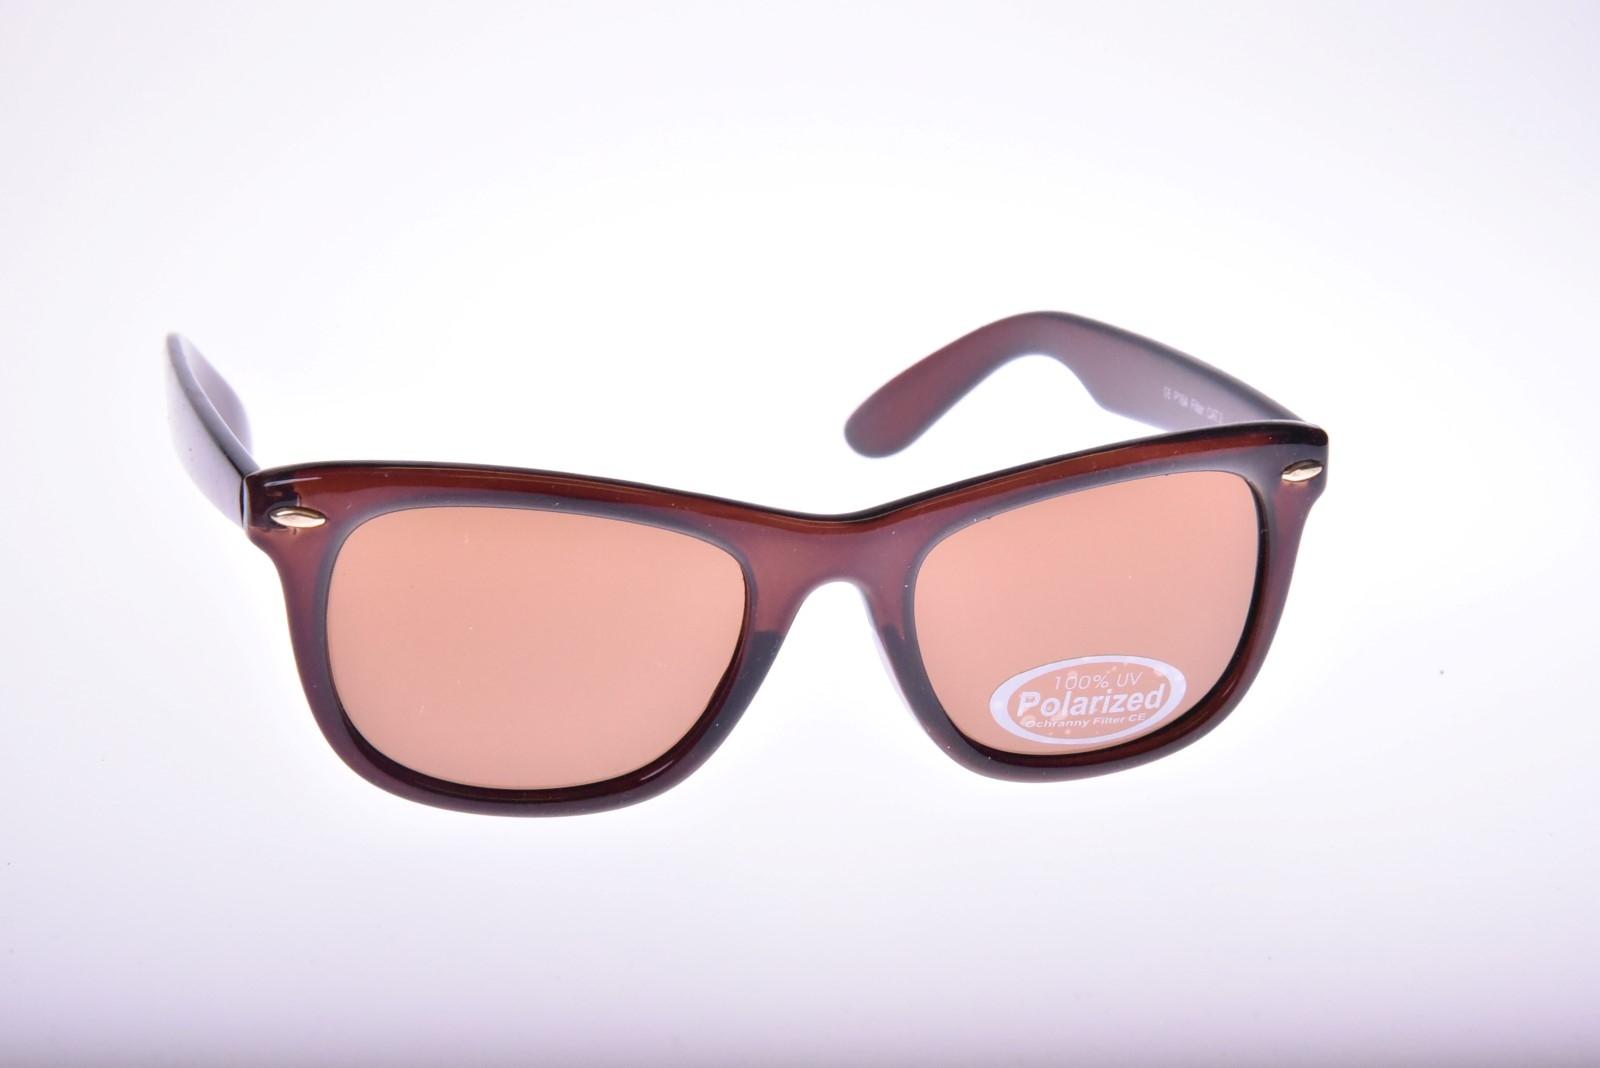 Extreme Core P164B - Unisex slnečné okuliare